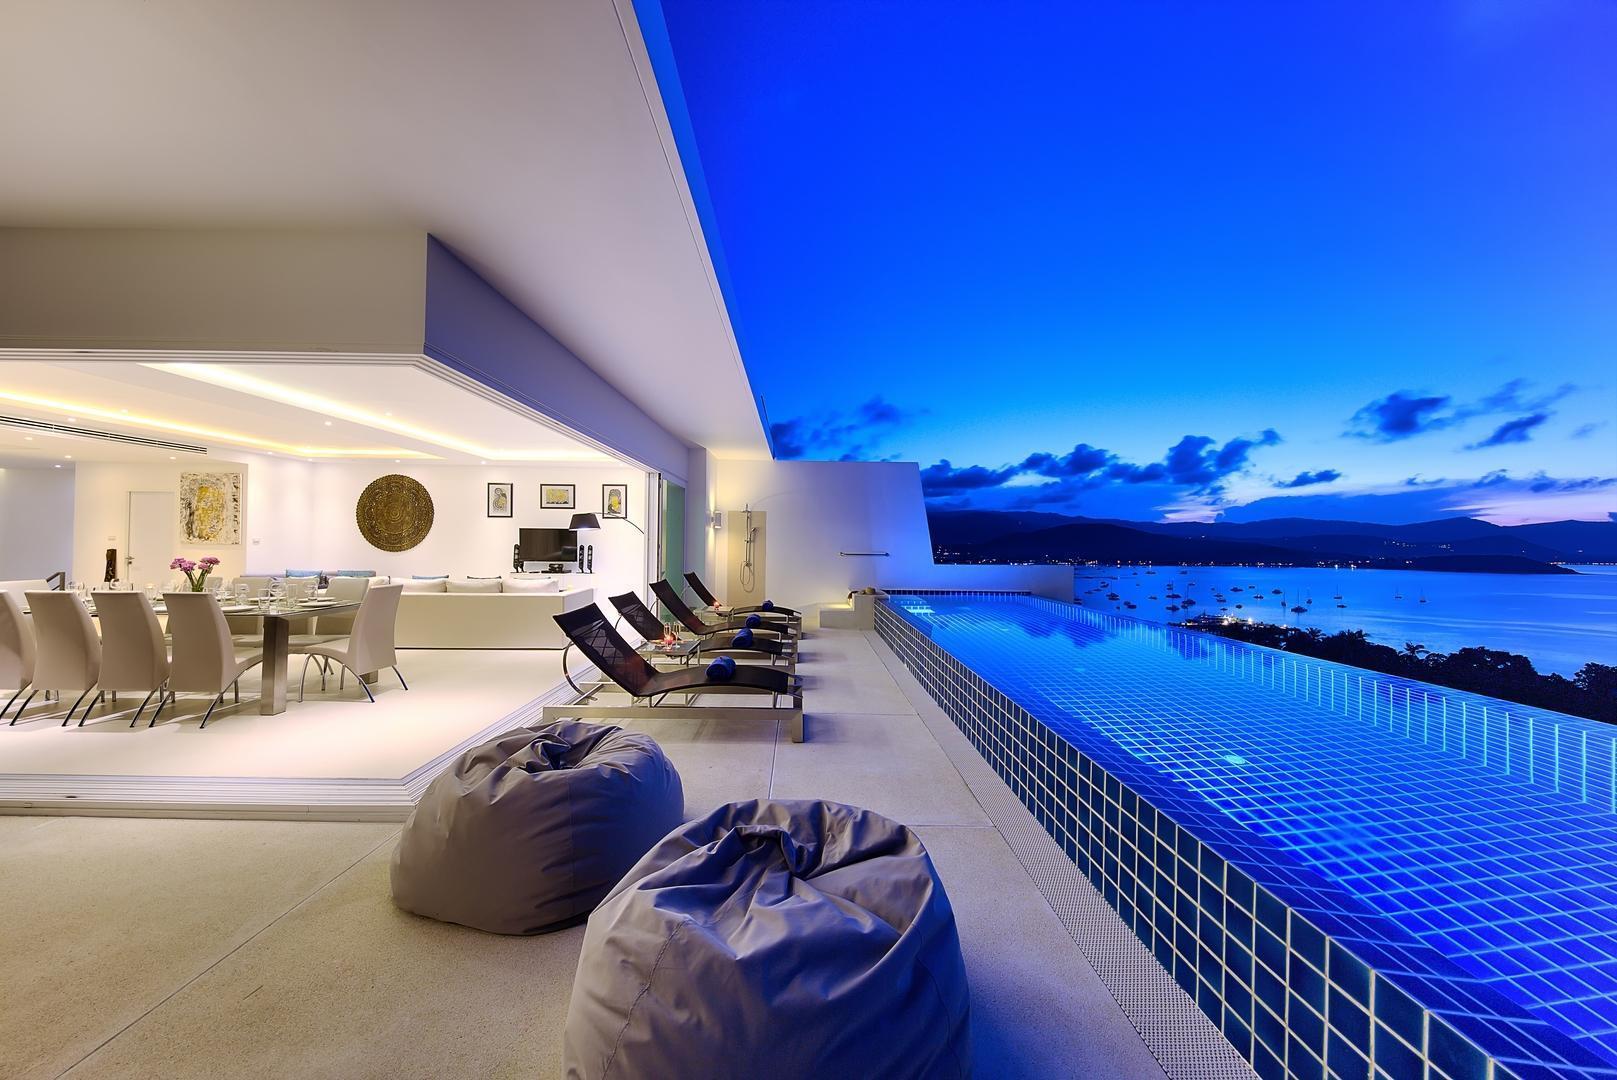 Luxury Villa with Pool & Ocean View วิลลา 4 ห้องนอน 5 ห้องน้ำส่วนตัว ขนาด 495 ตร.ม. – เชิงมน